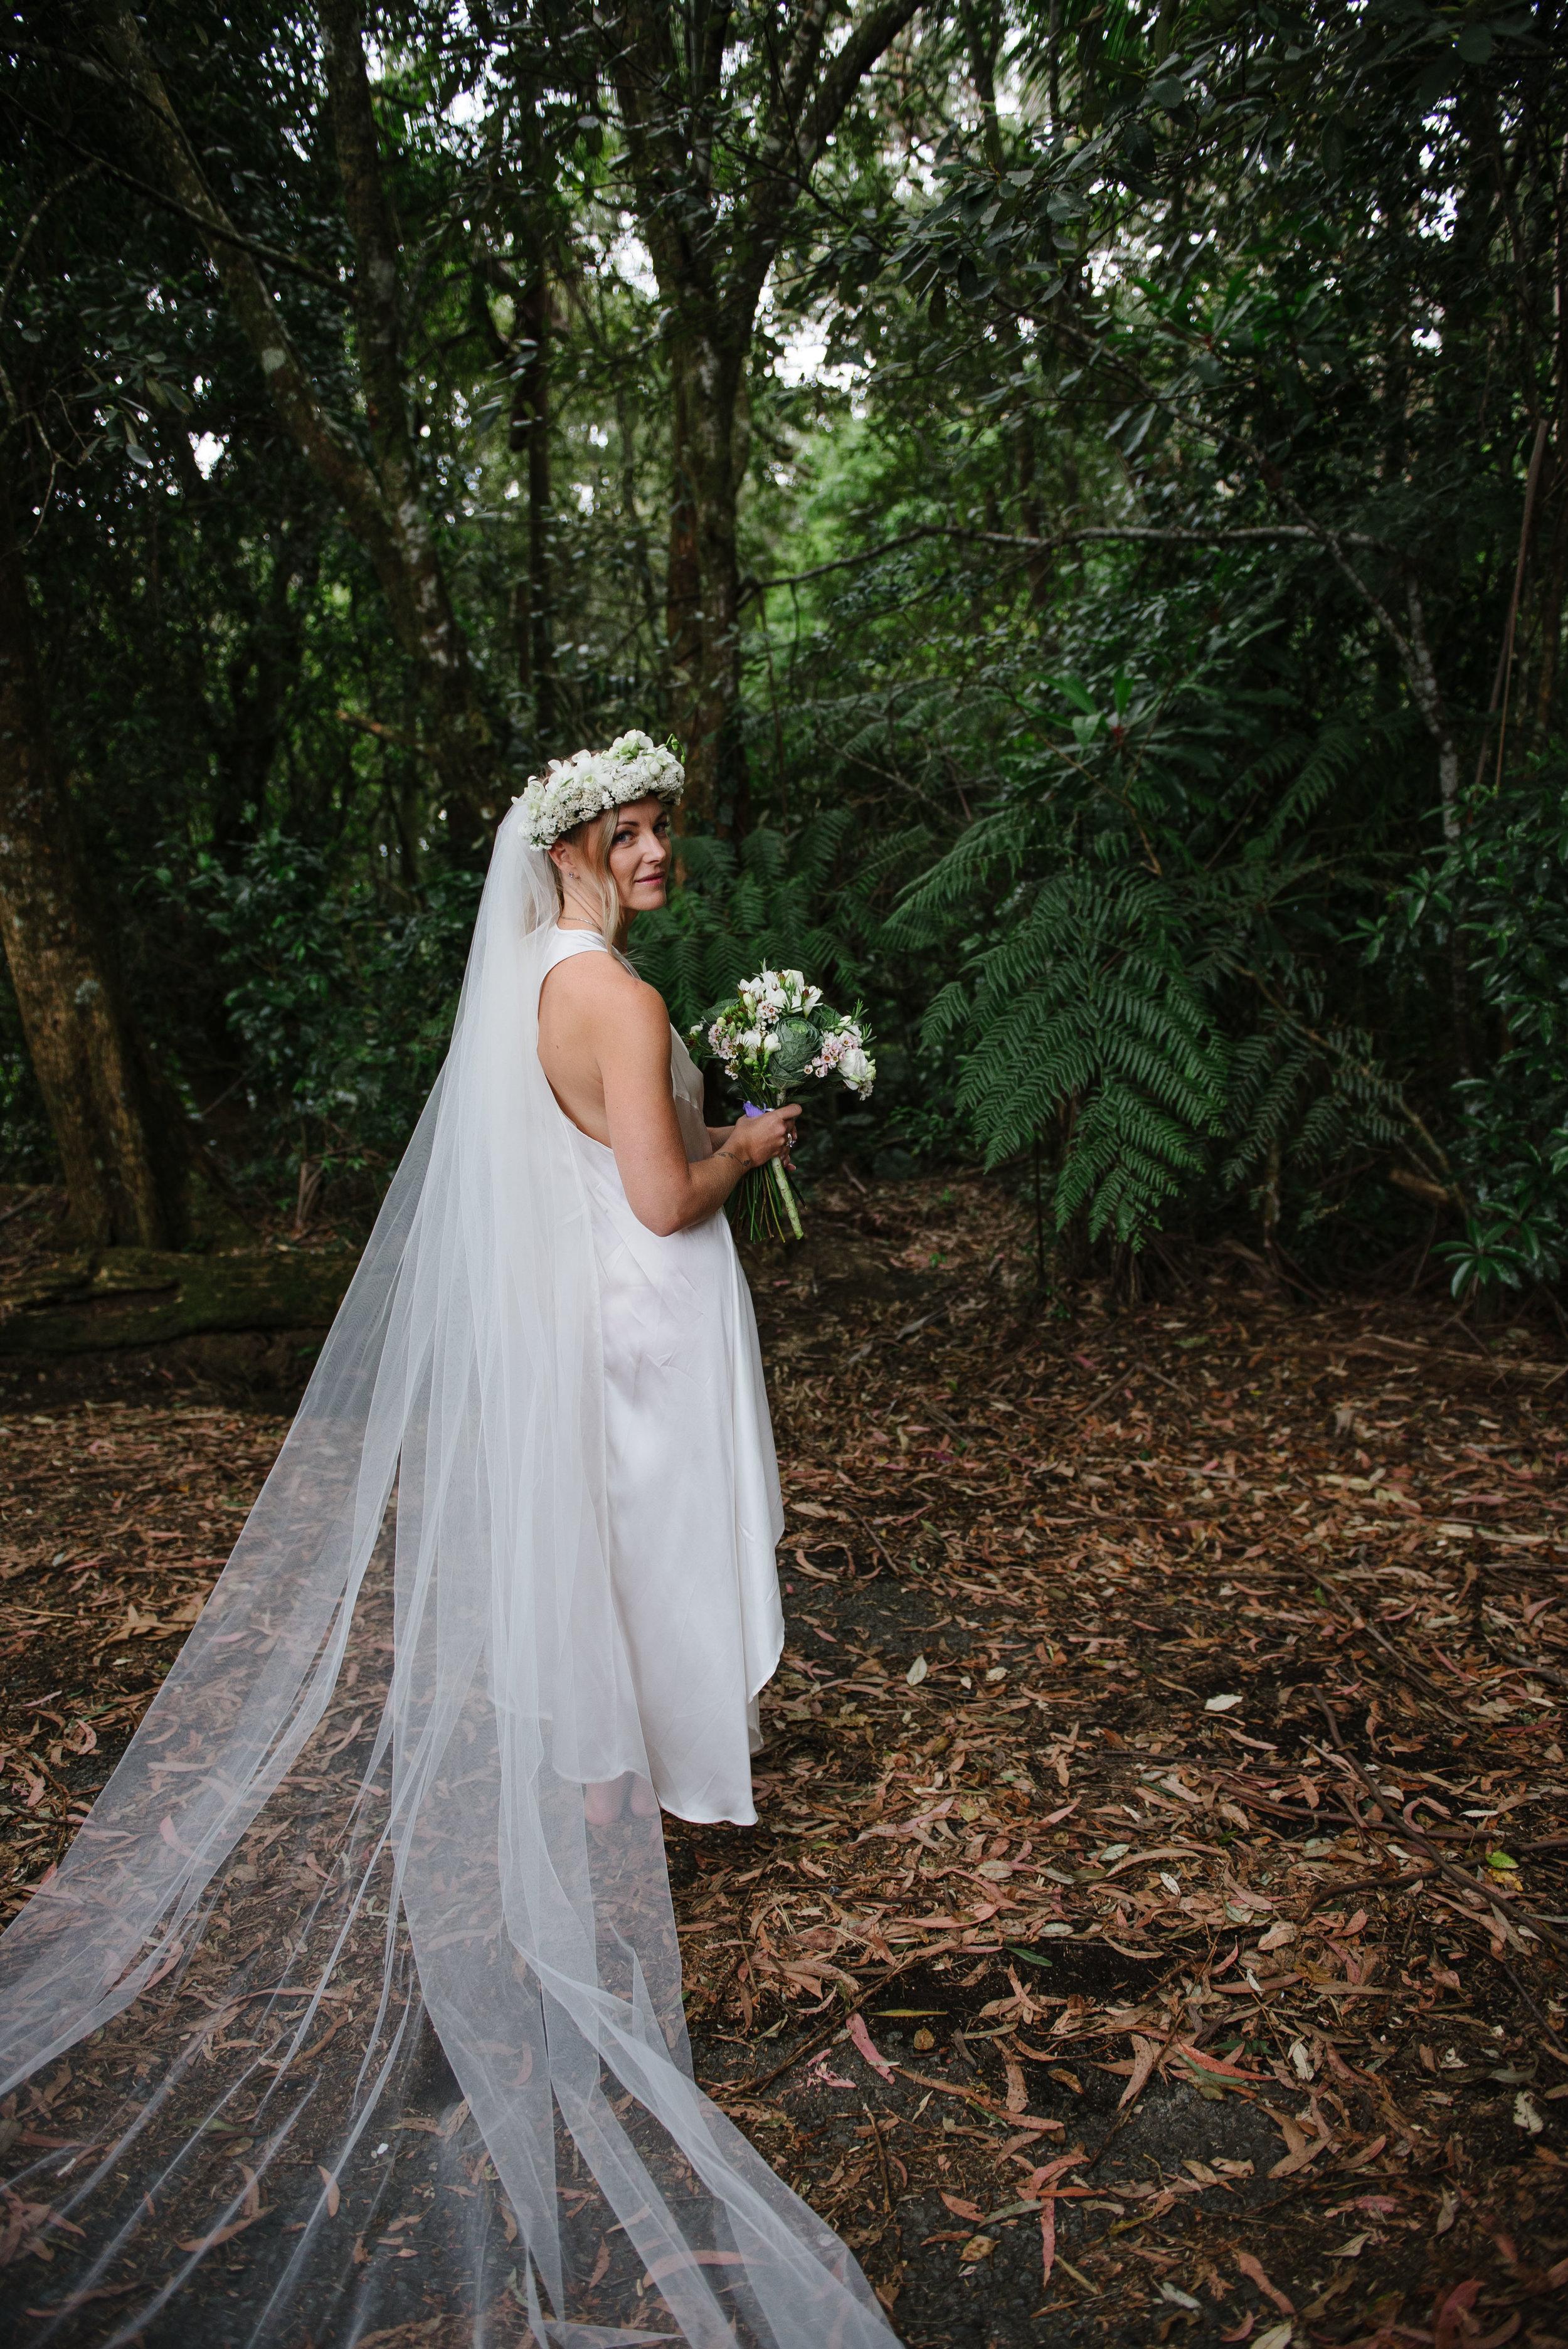 Carla and Luke- wedding photographer, byron bay wedding and family photographer, tweed heads wedding and family photography-127.jpg